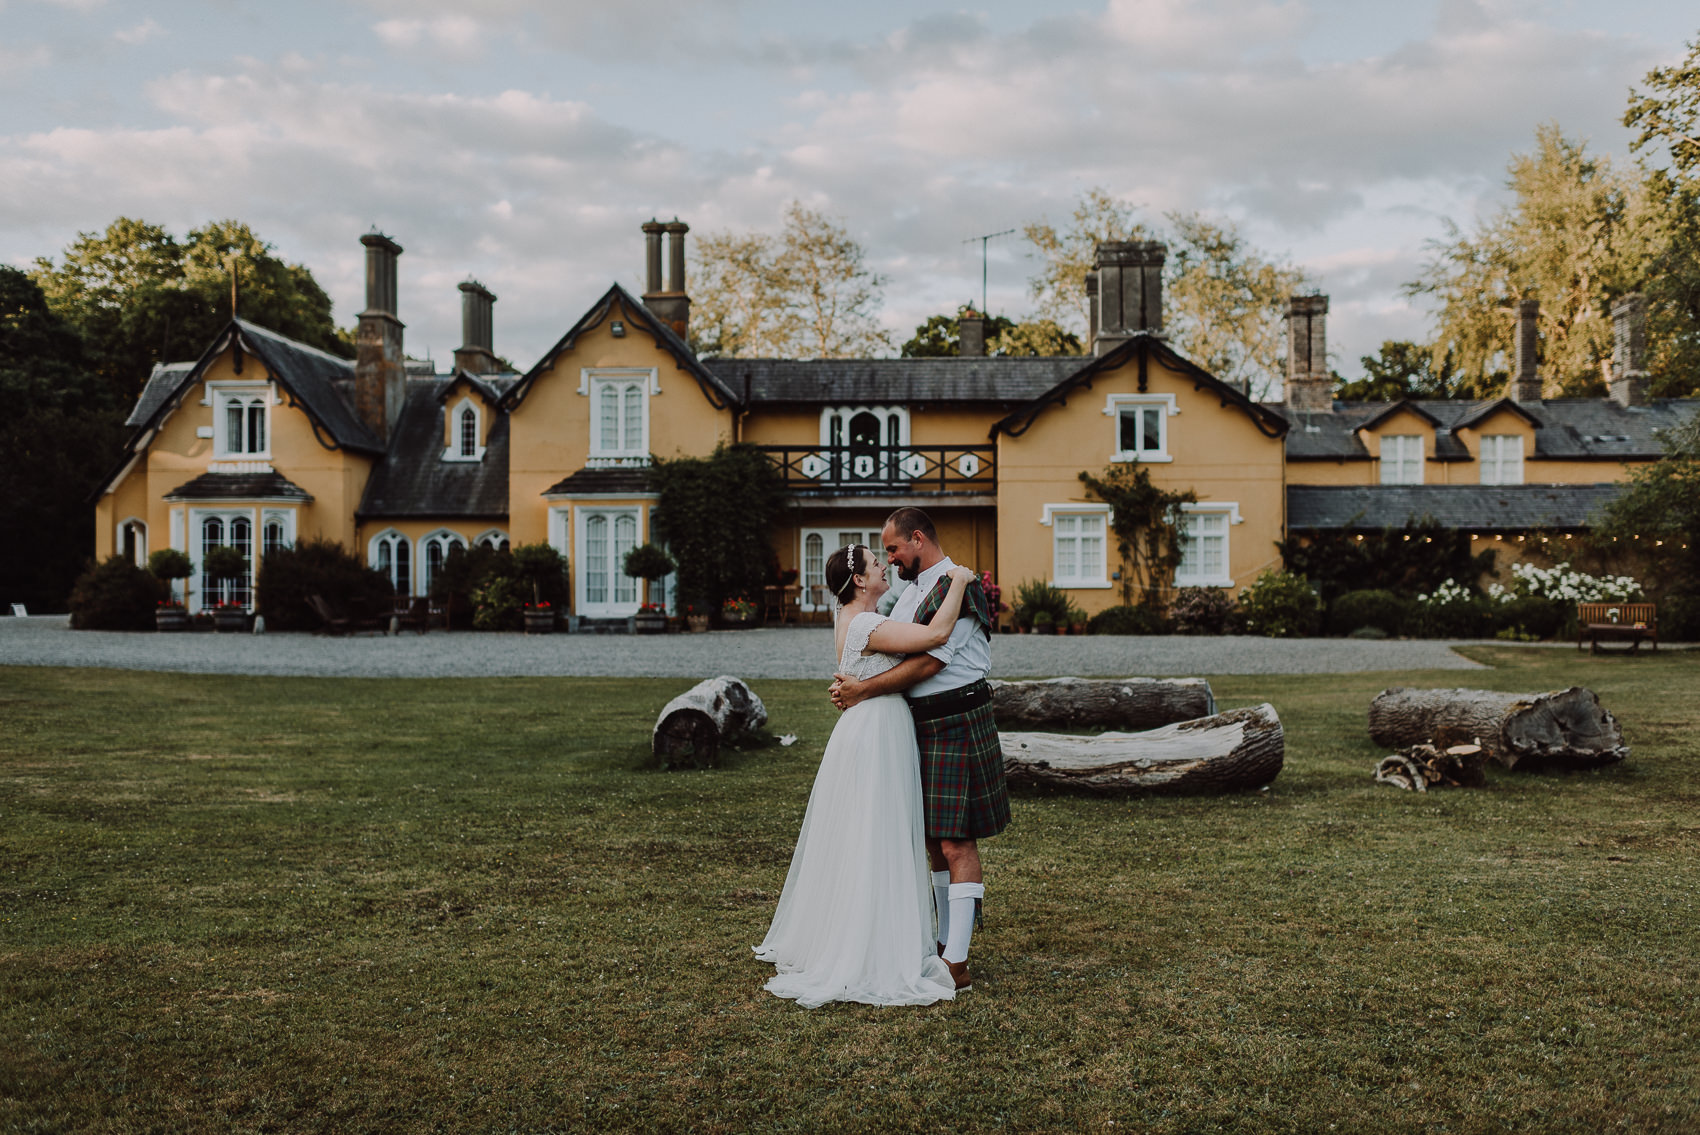 Photography by Ciara - wedding photographer 12